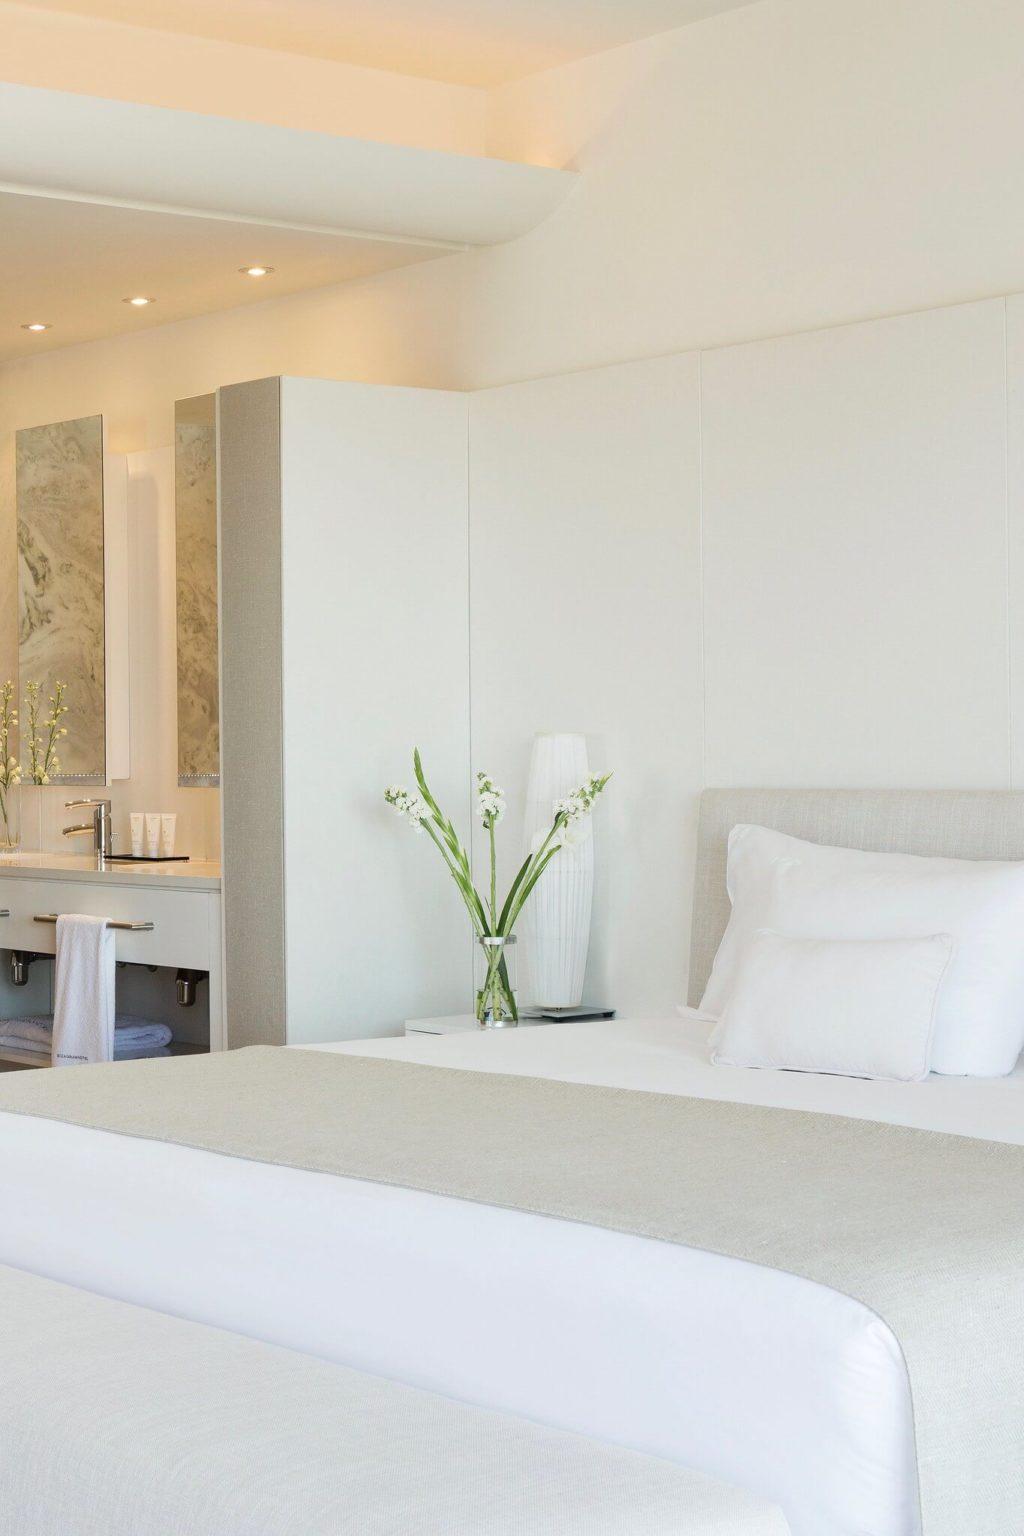 https://www.white-ibiza.com/wp-content/uploads/2020/02/white-ibiza-hotels-ibiza-gran-hotel-2020-09-1024x1536.jpg